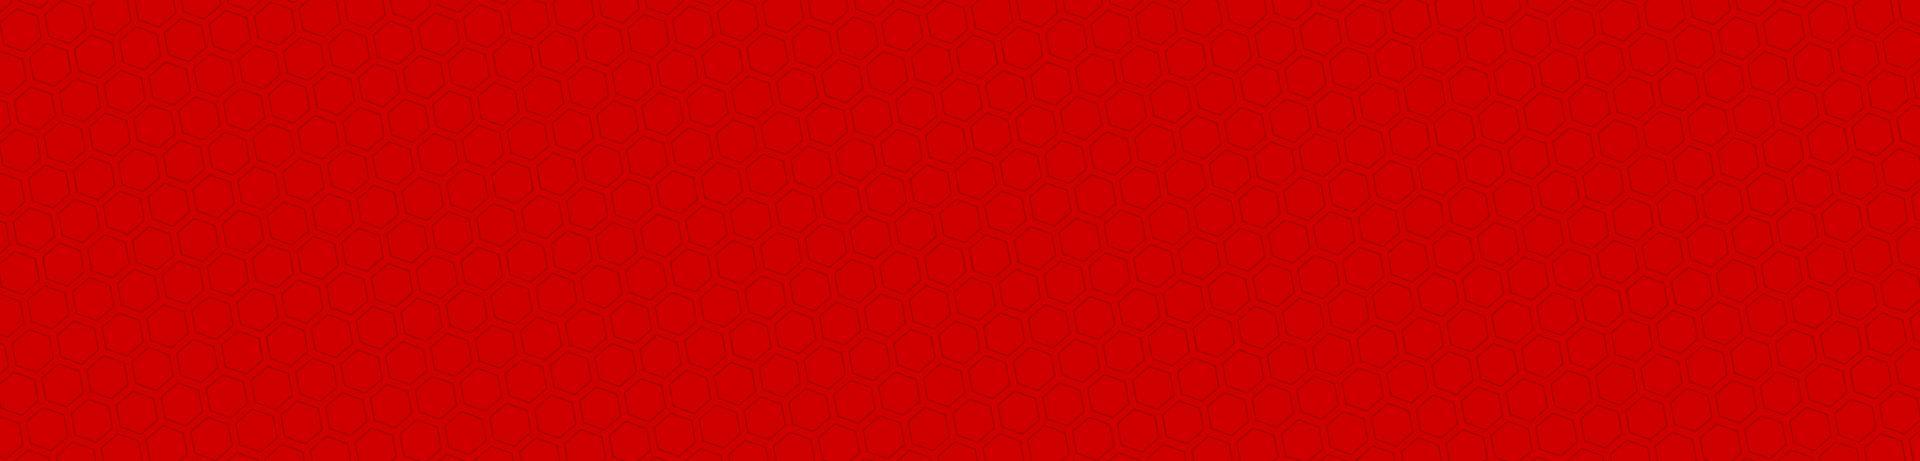 Red hexagonal pattern